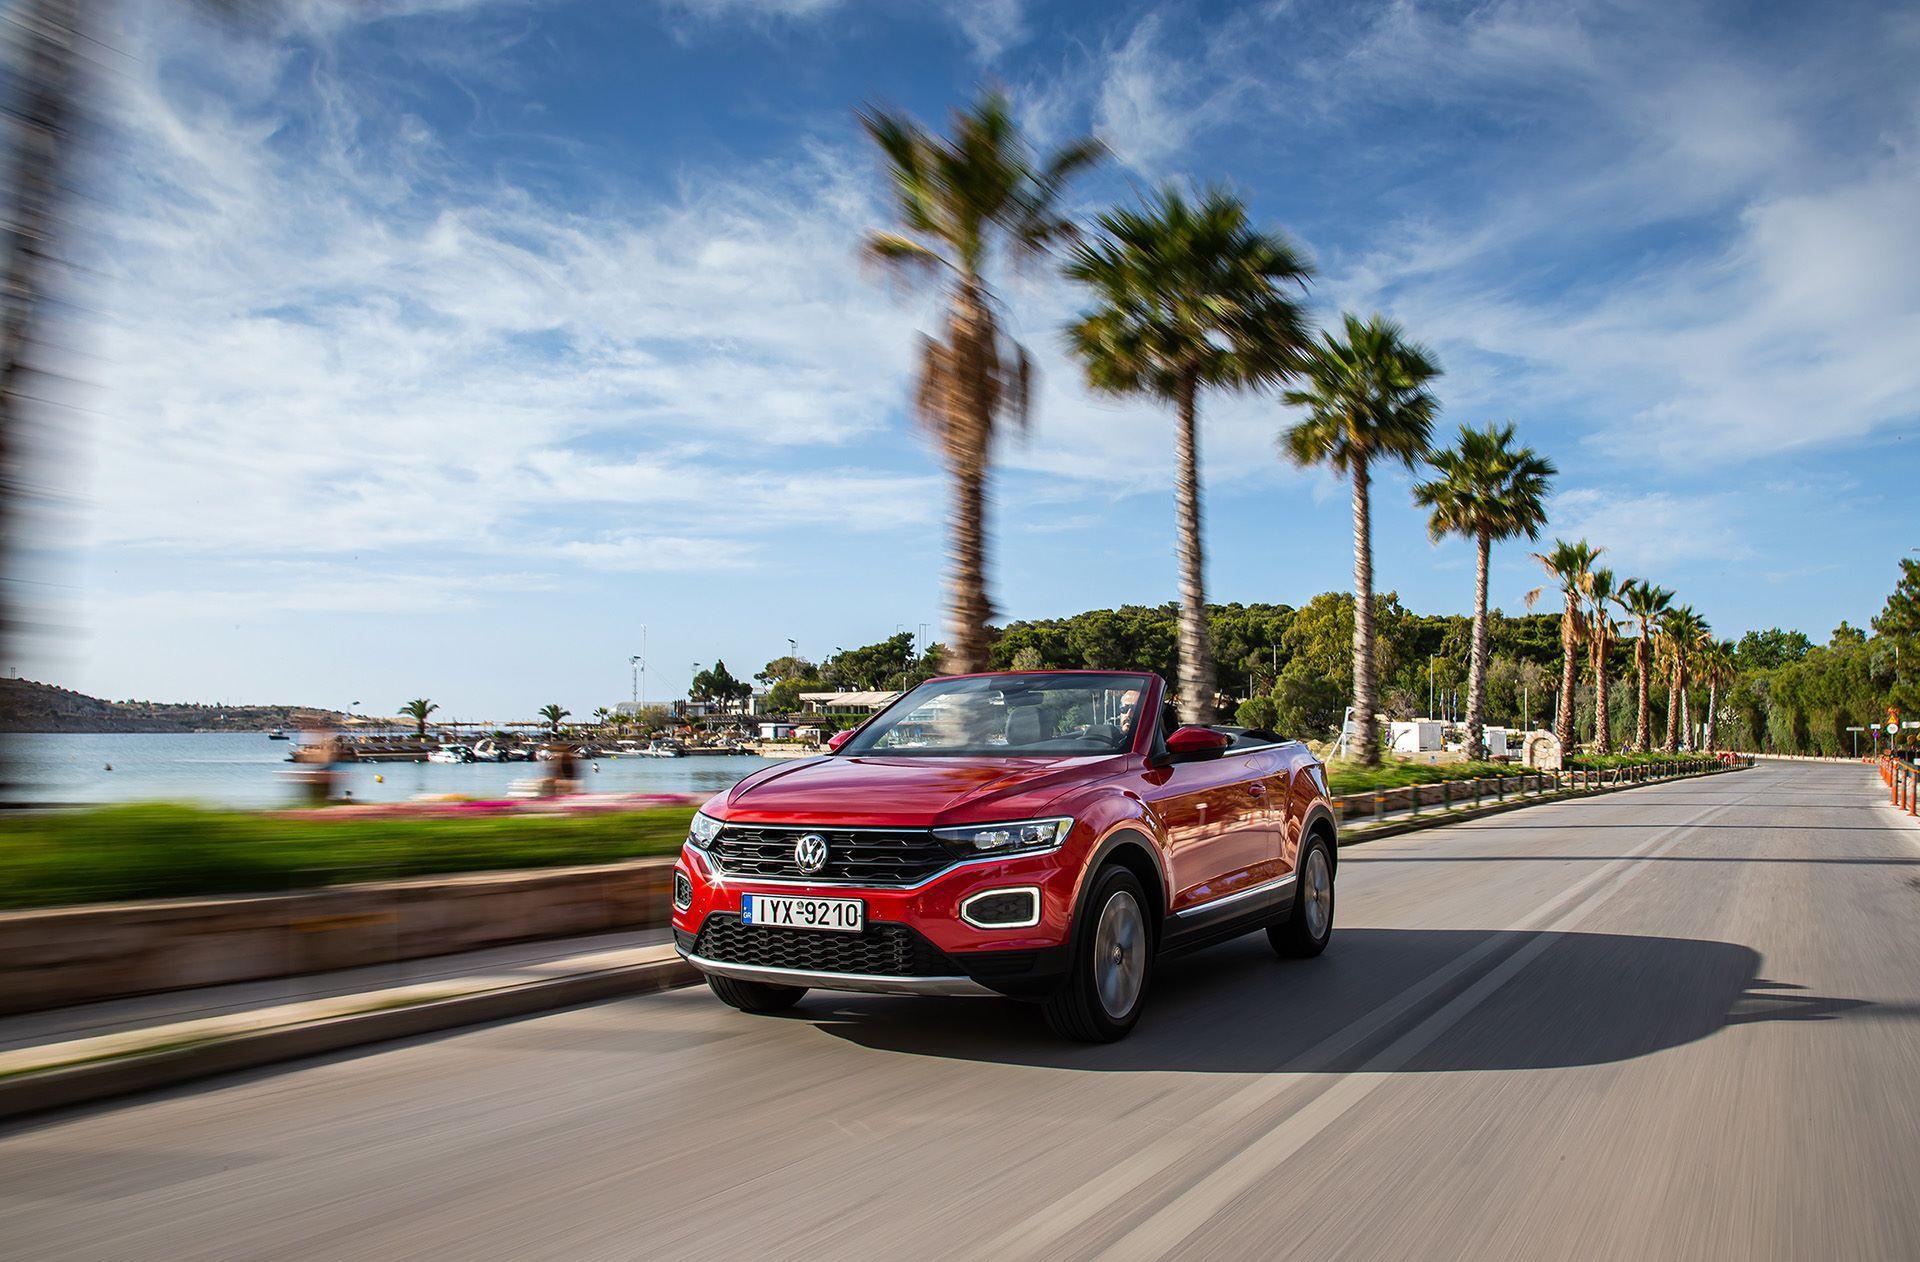 Volkswagen-T-Roc-Cabriolet-Greece-2